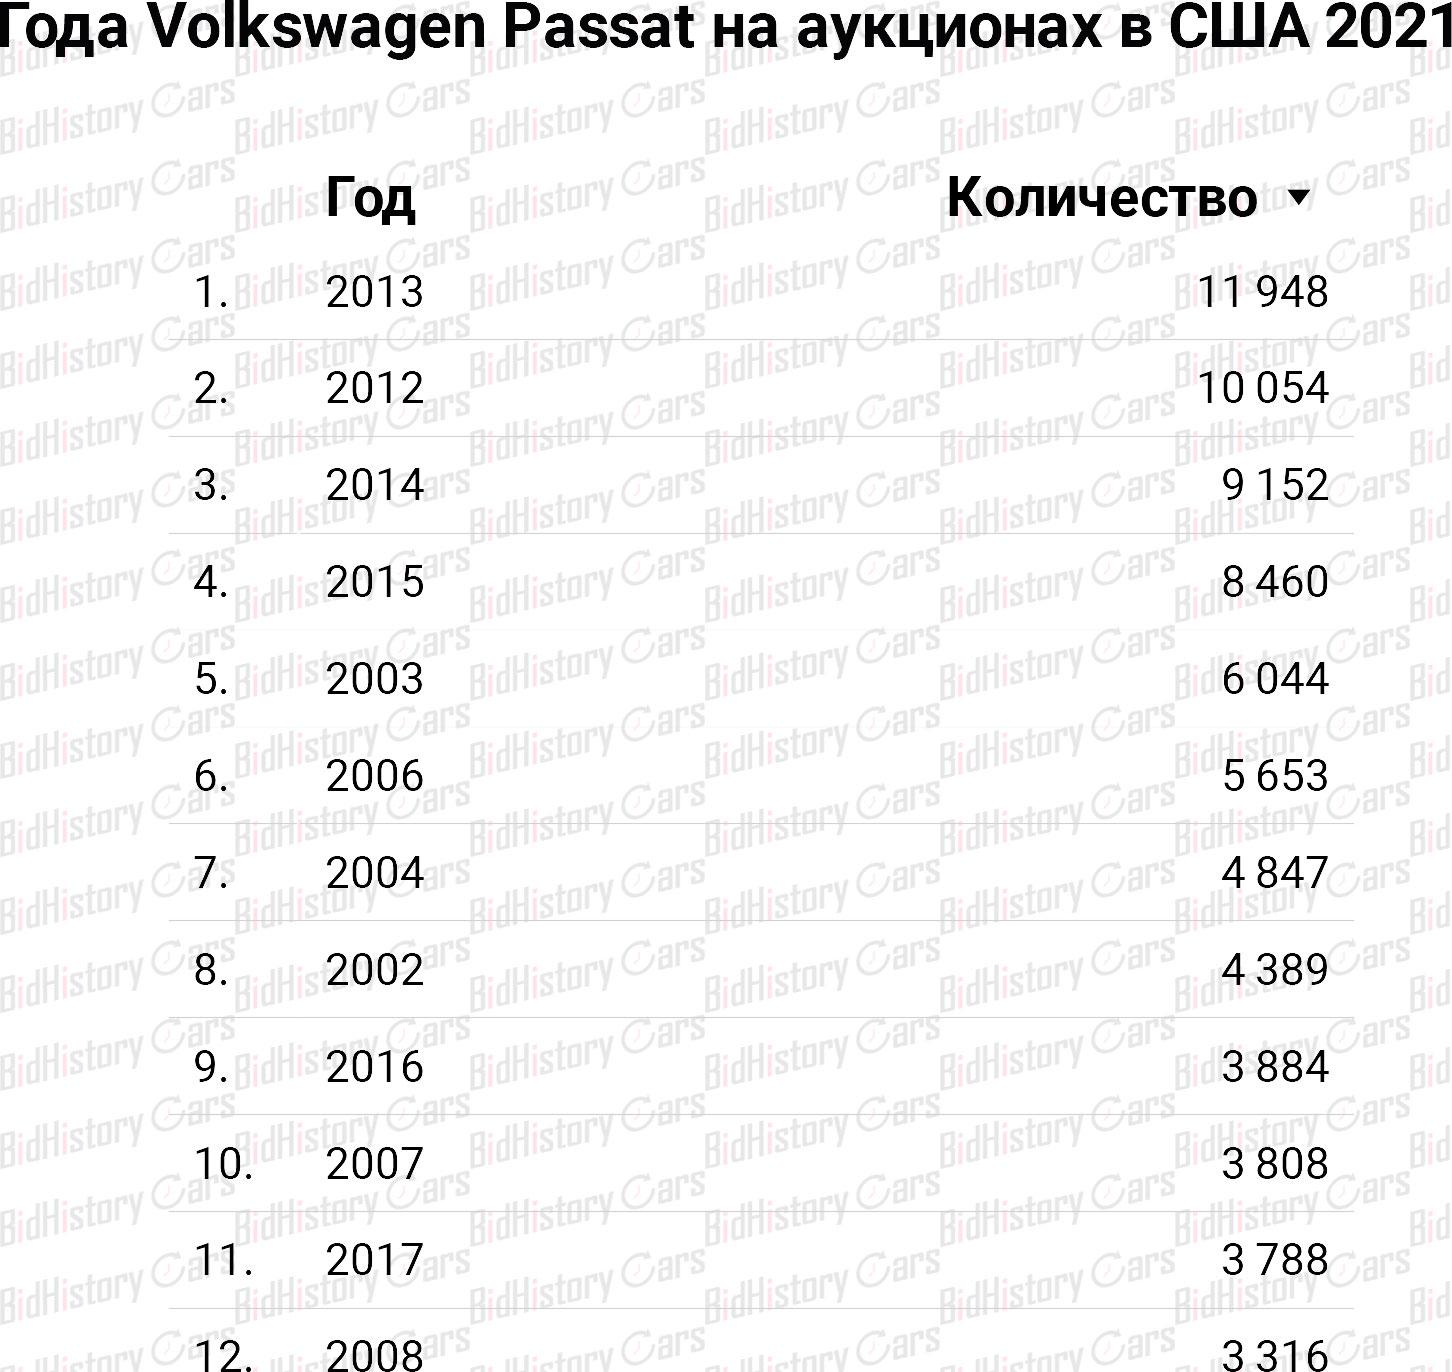 Года Volkswagen Passat на аукционах в США 2021